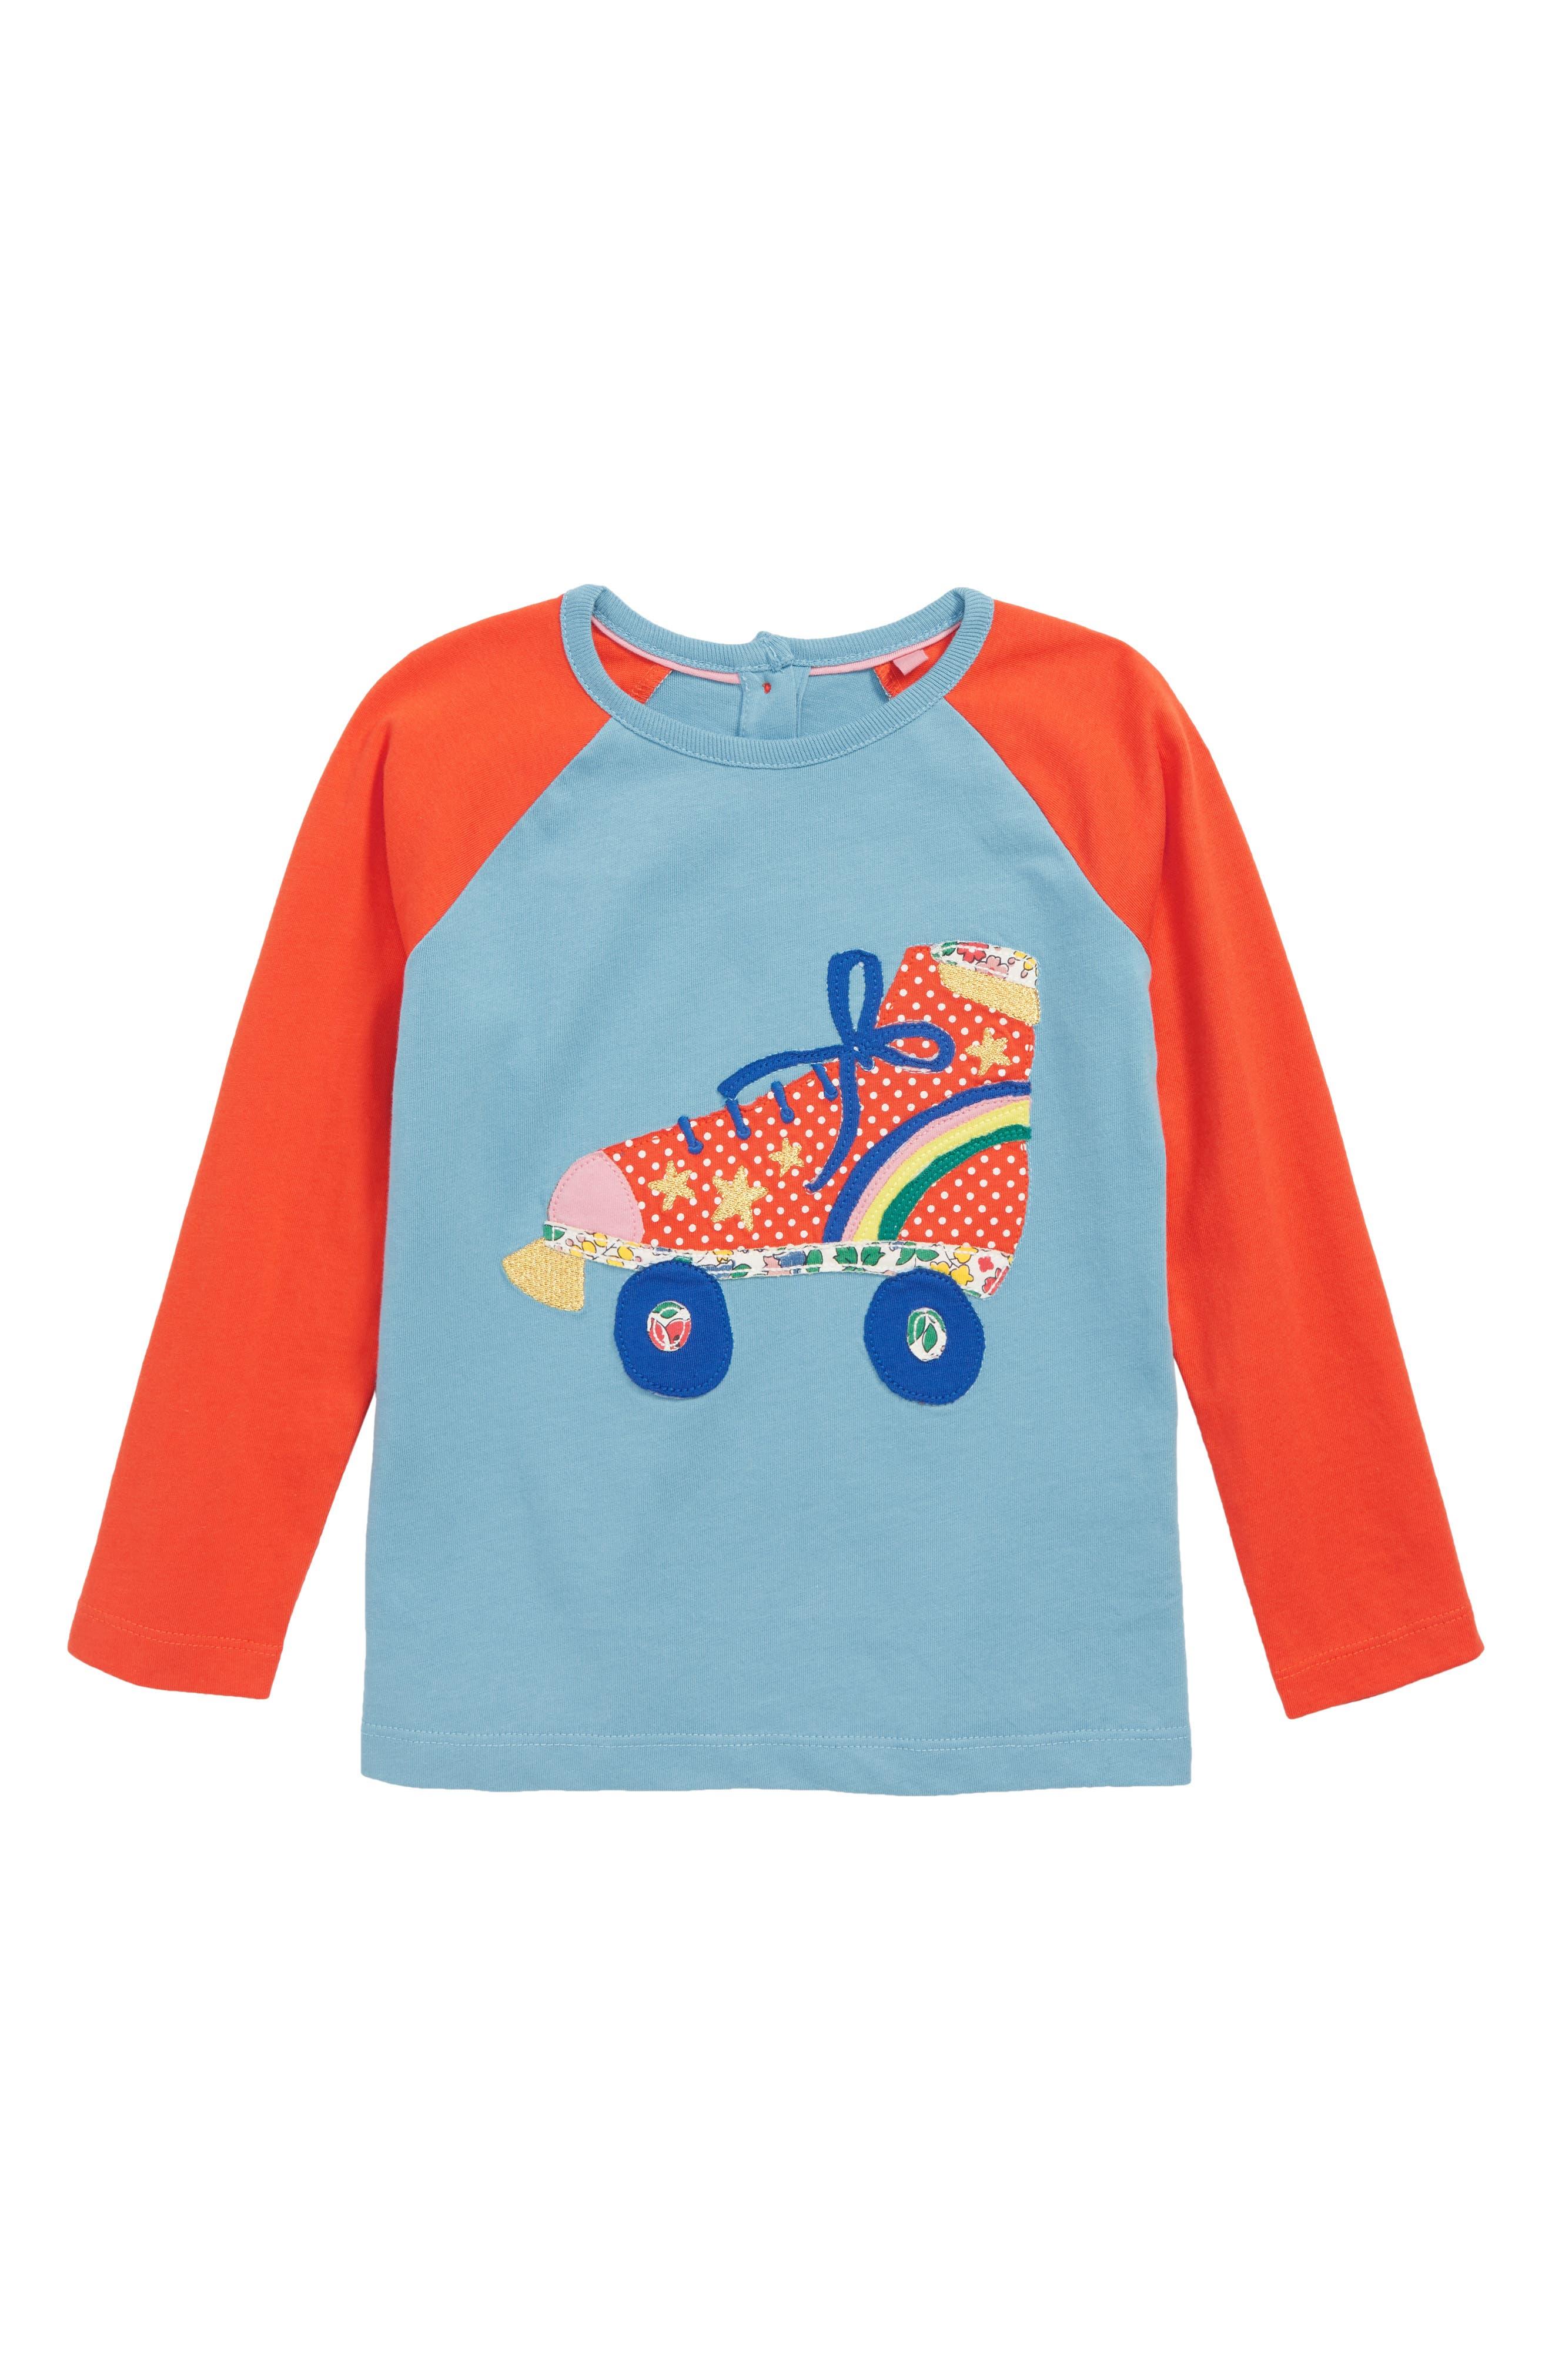 Appliqué Raglan T-Shirt,                         Main,                         color, DELPHINIUM BLUE ROLLERBOOT